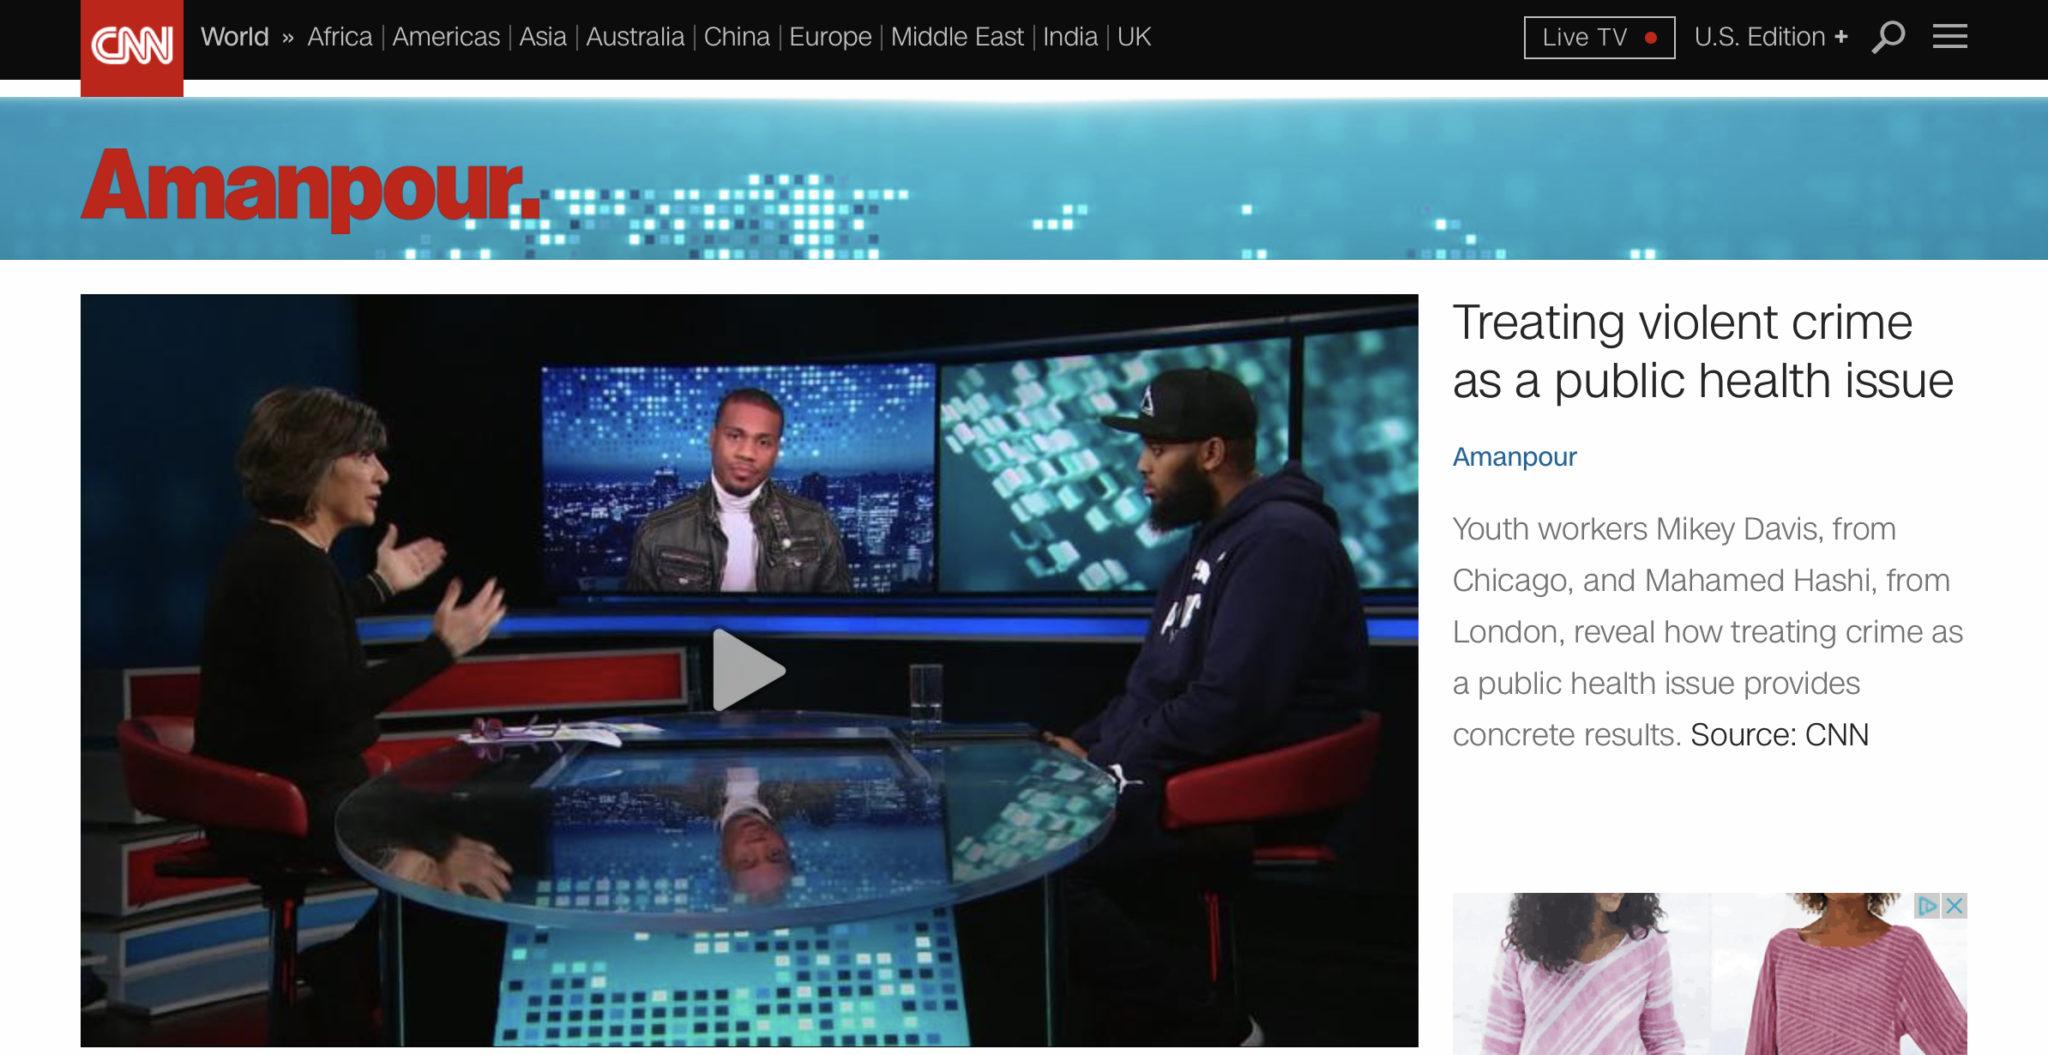 CNN: Treating violent crime as a public health issue